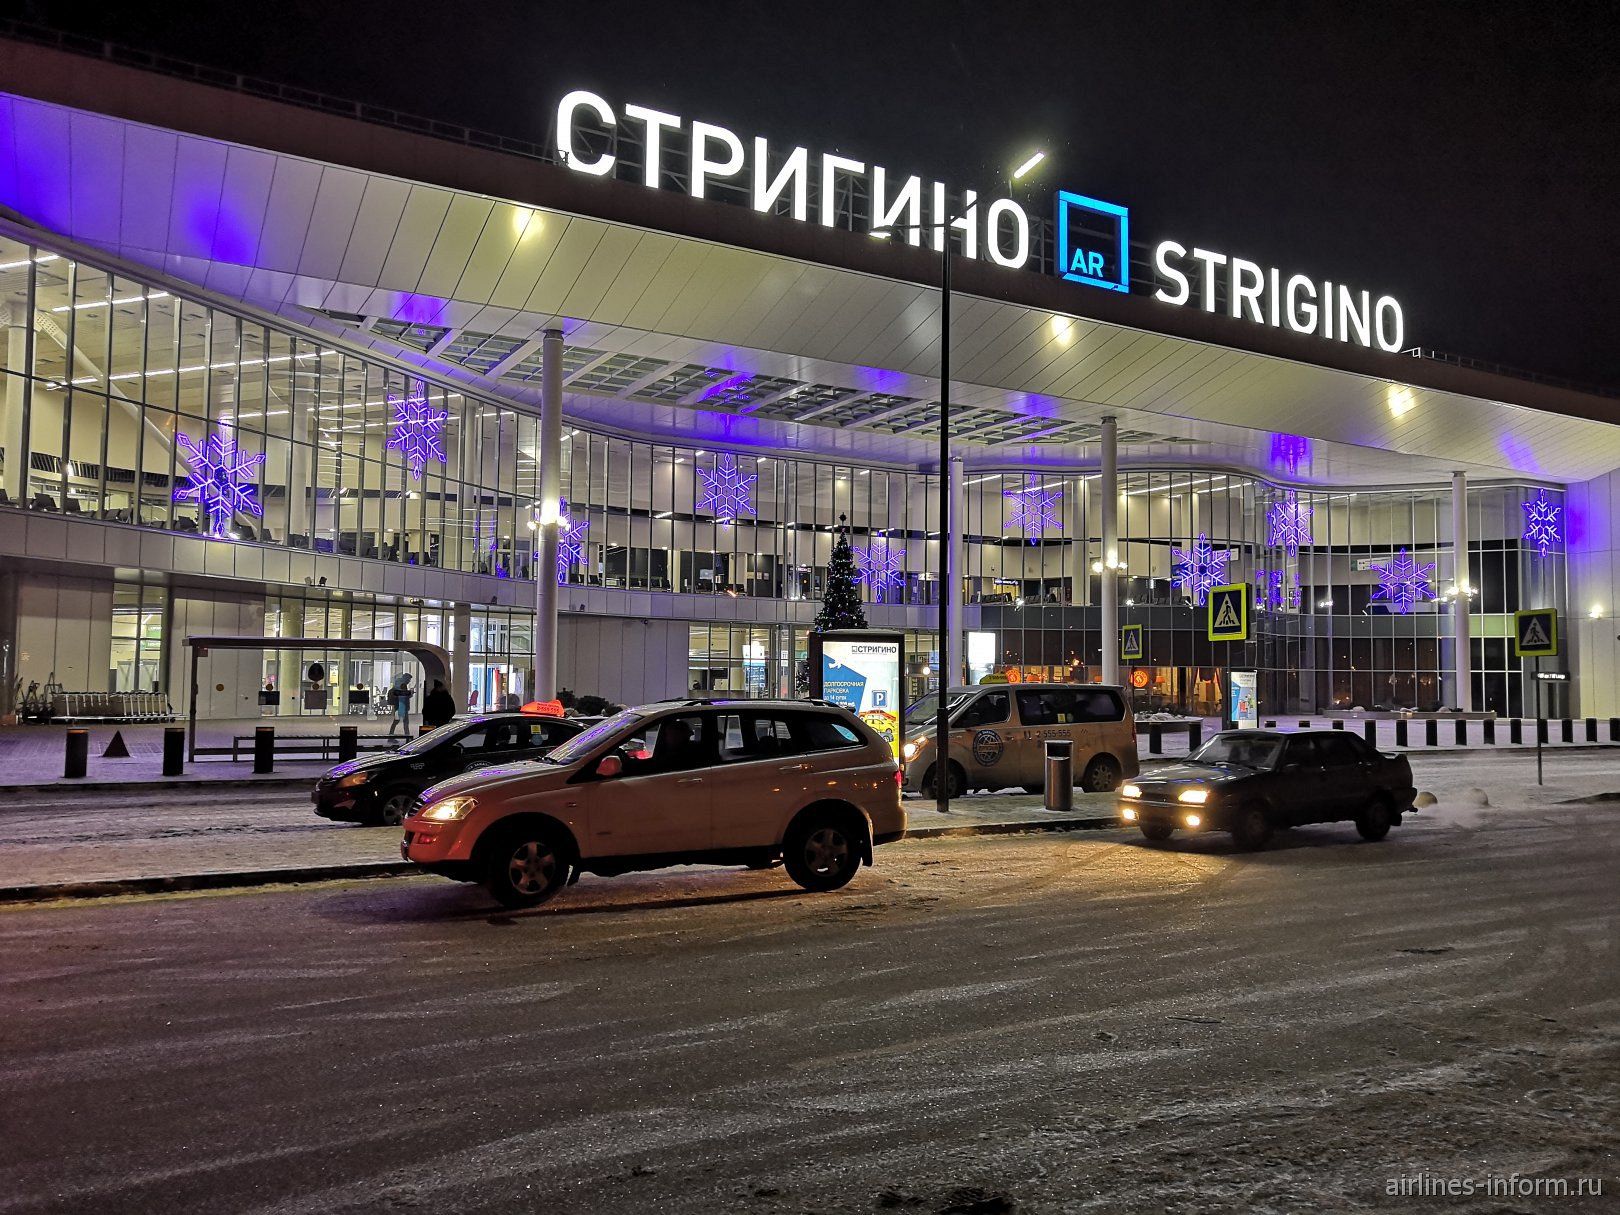 Пассажирский терминал аэропорта Нижний Новгород Стригино